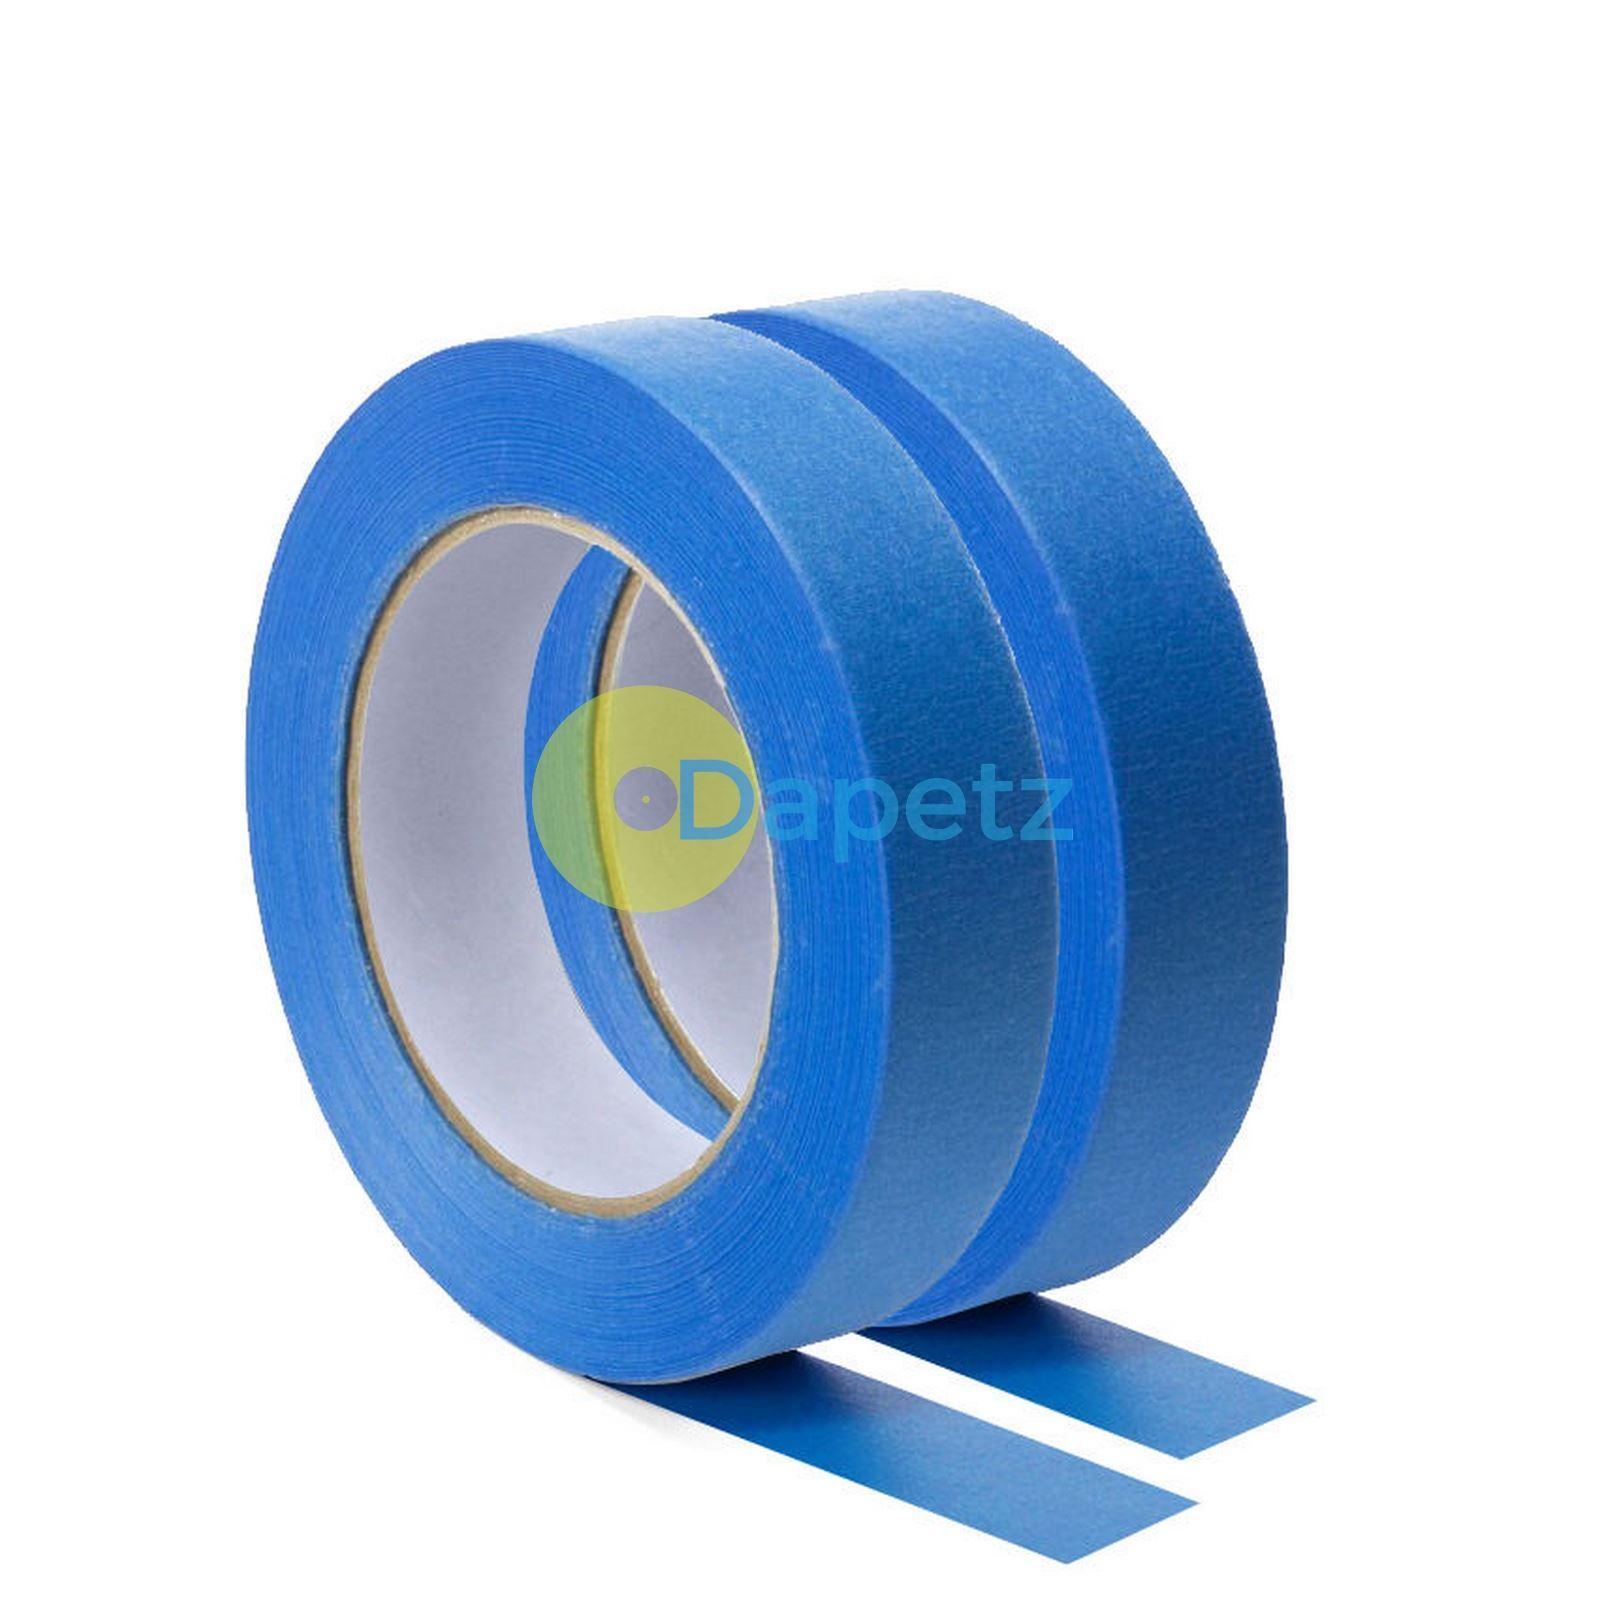 Blau Masking Tape Clean Peel UV Resistant Painters/Decorators 24mm x 50m